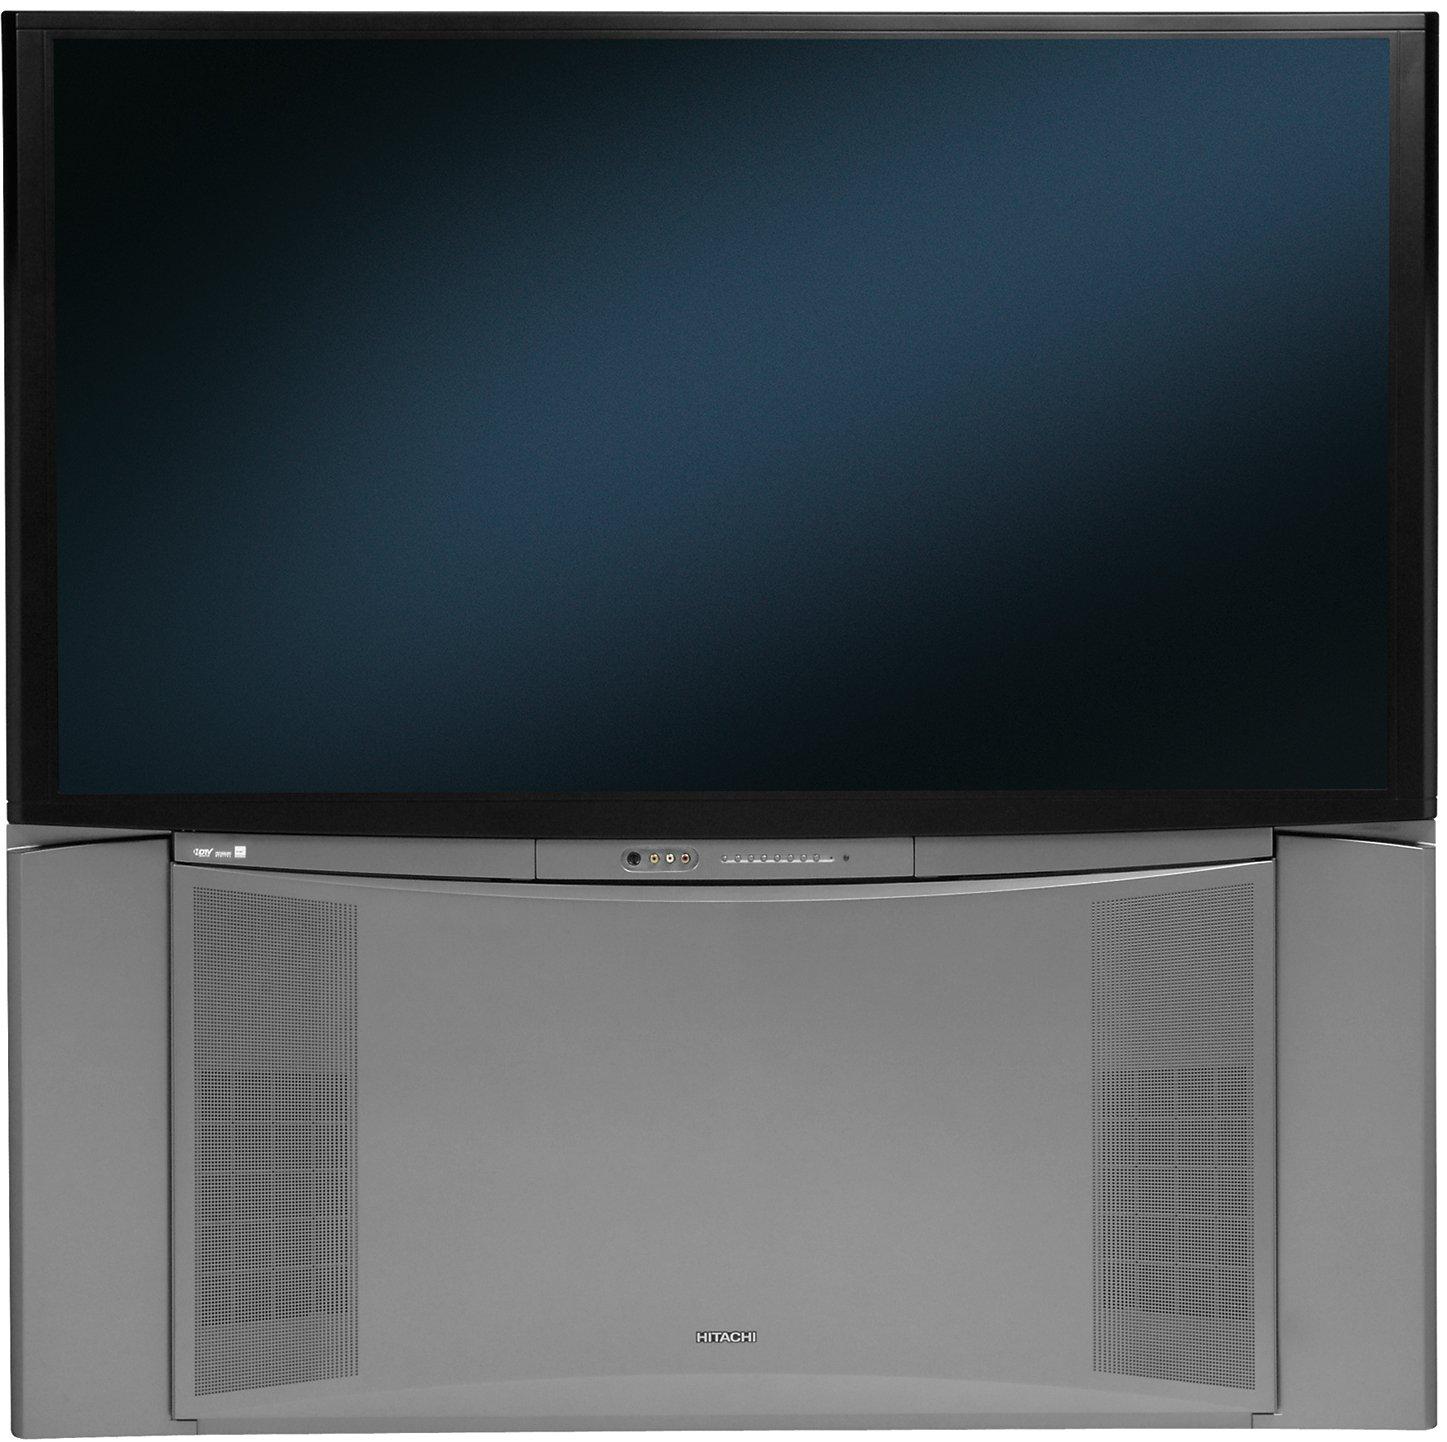 hitachi 55 inch tv. hitachi 55 inch tv